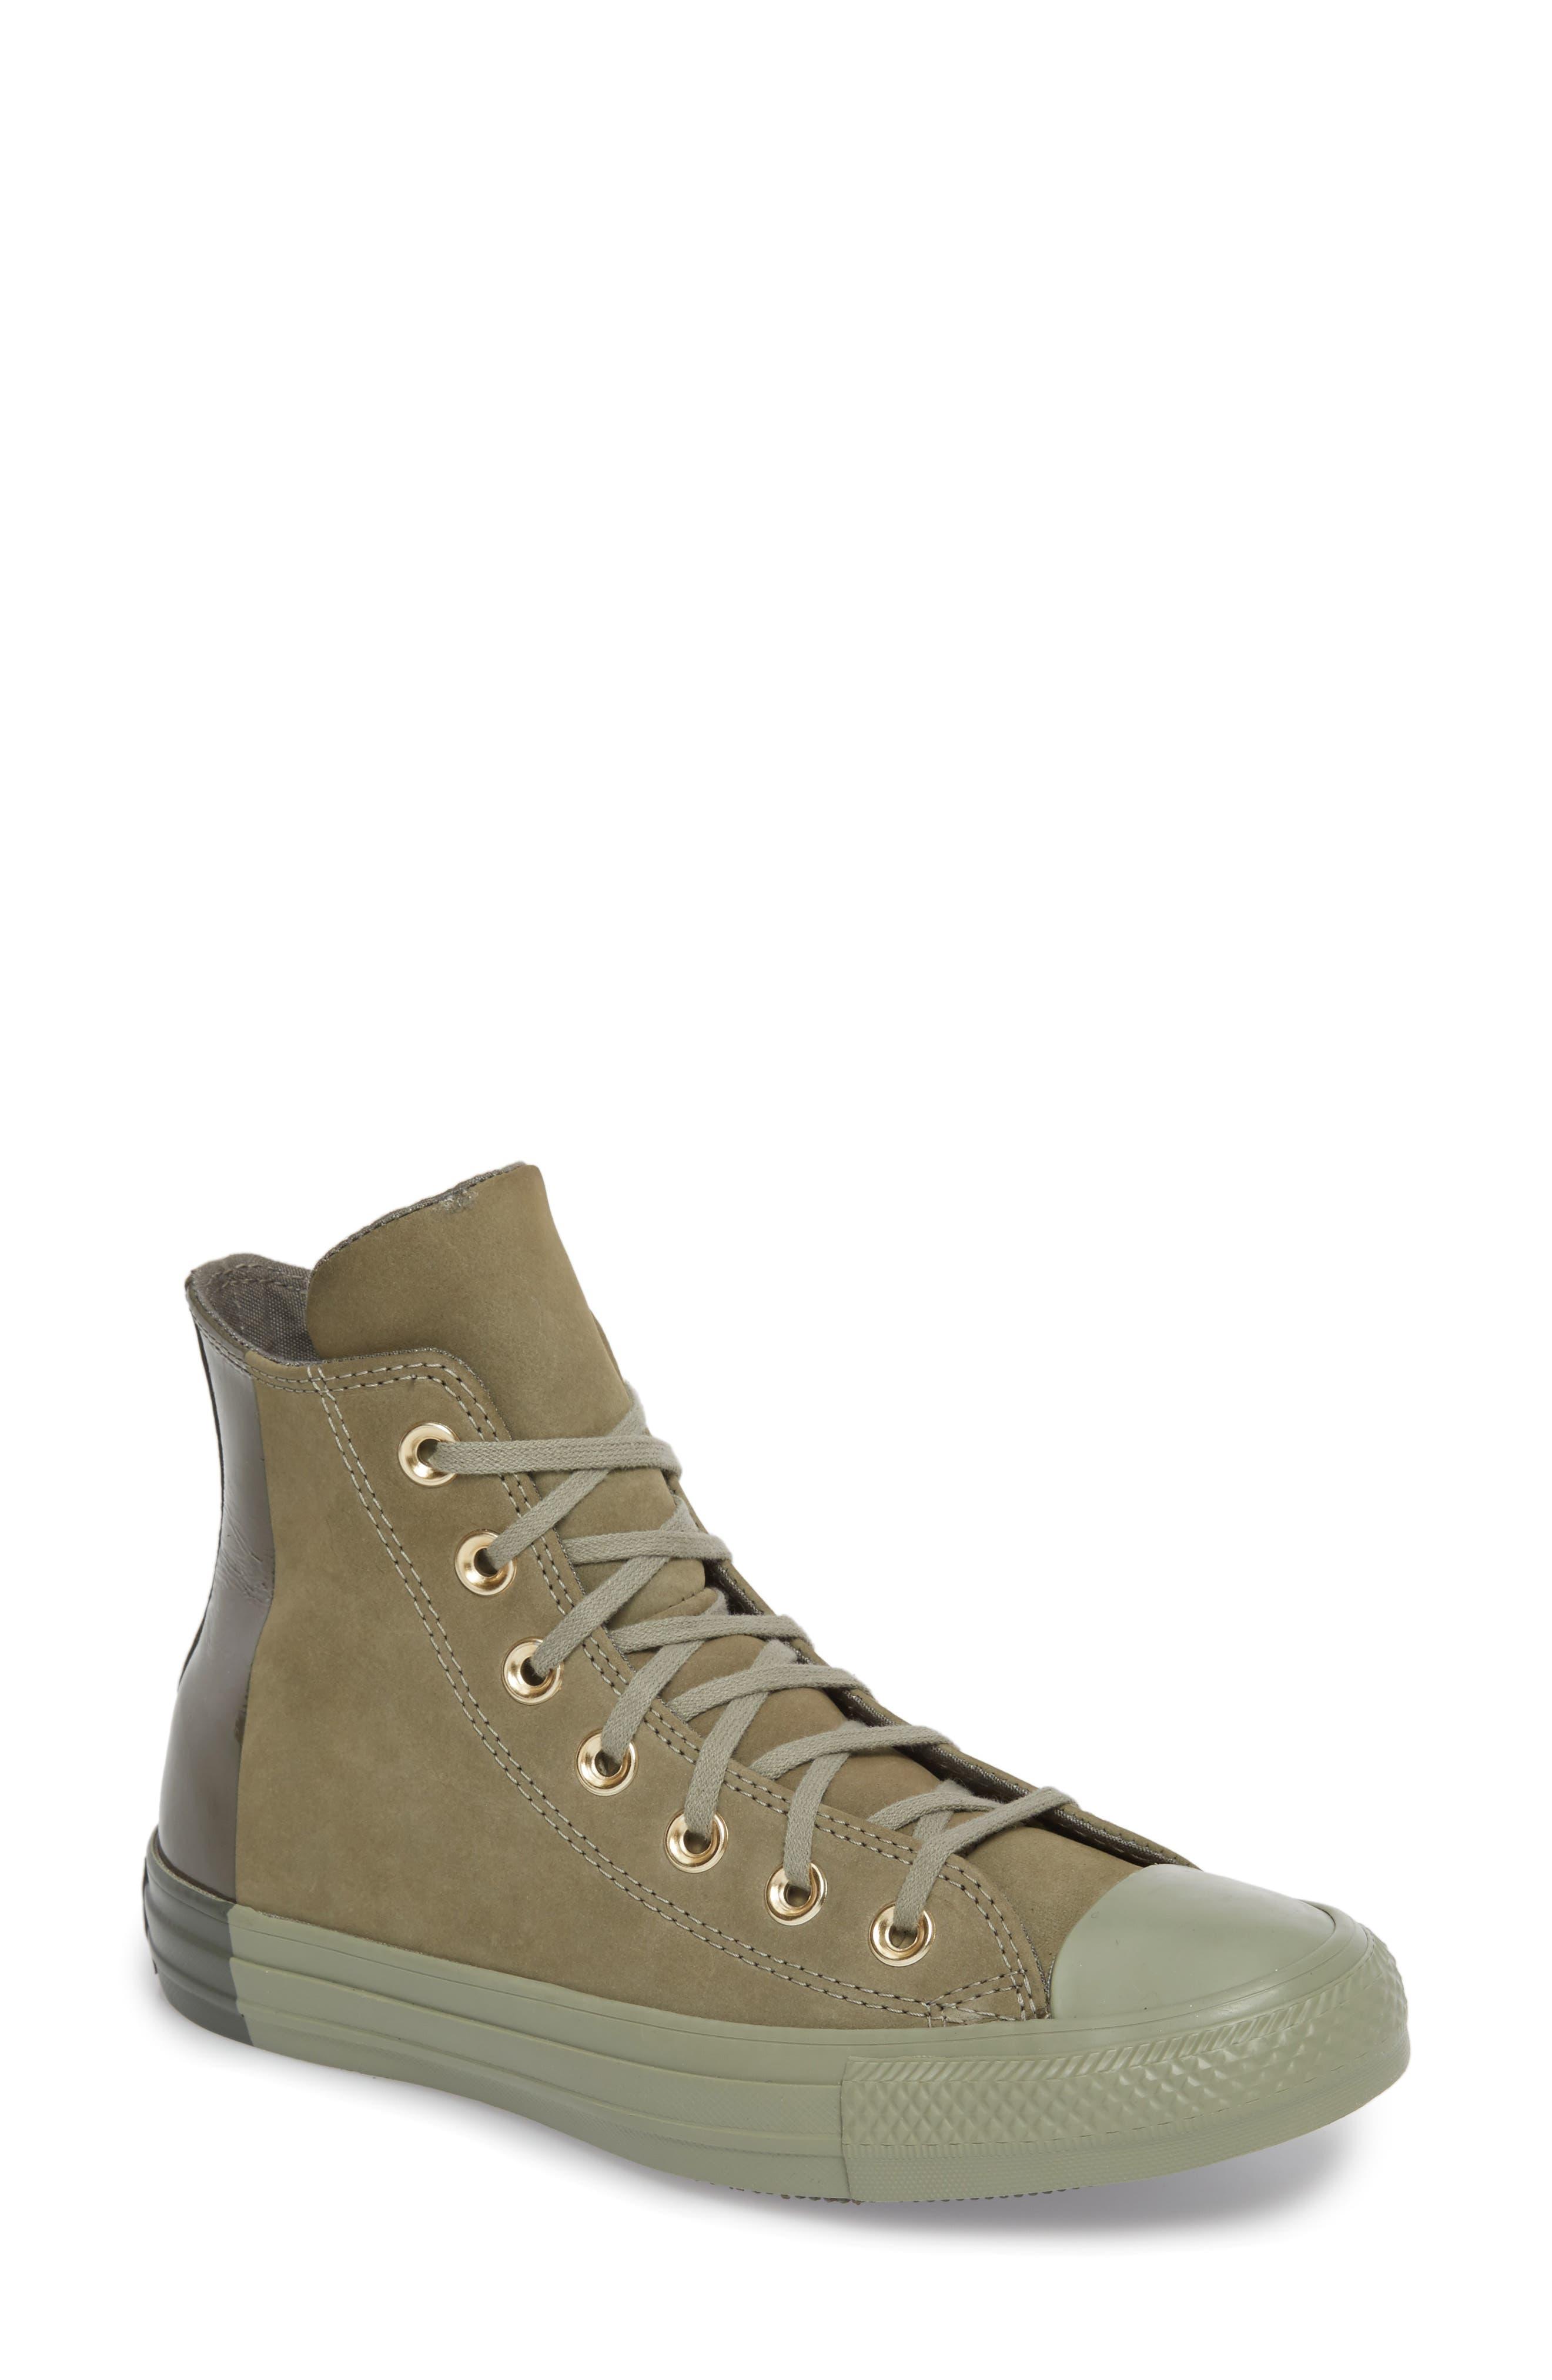 Main Image - Converse Chuck Taylor® All Star® High Top Sneaker (Women)